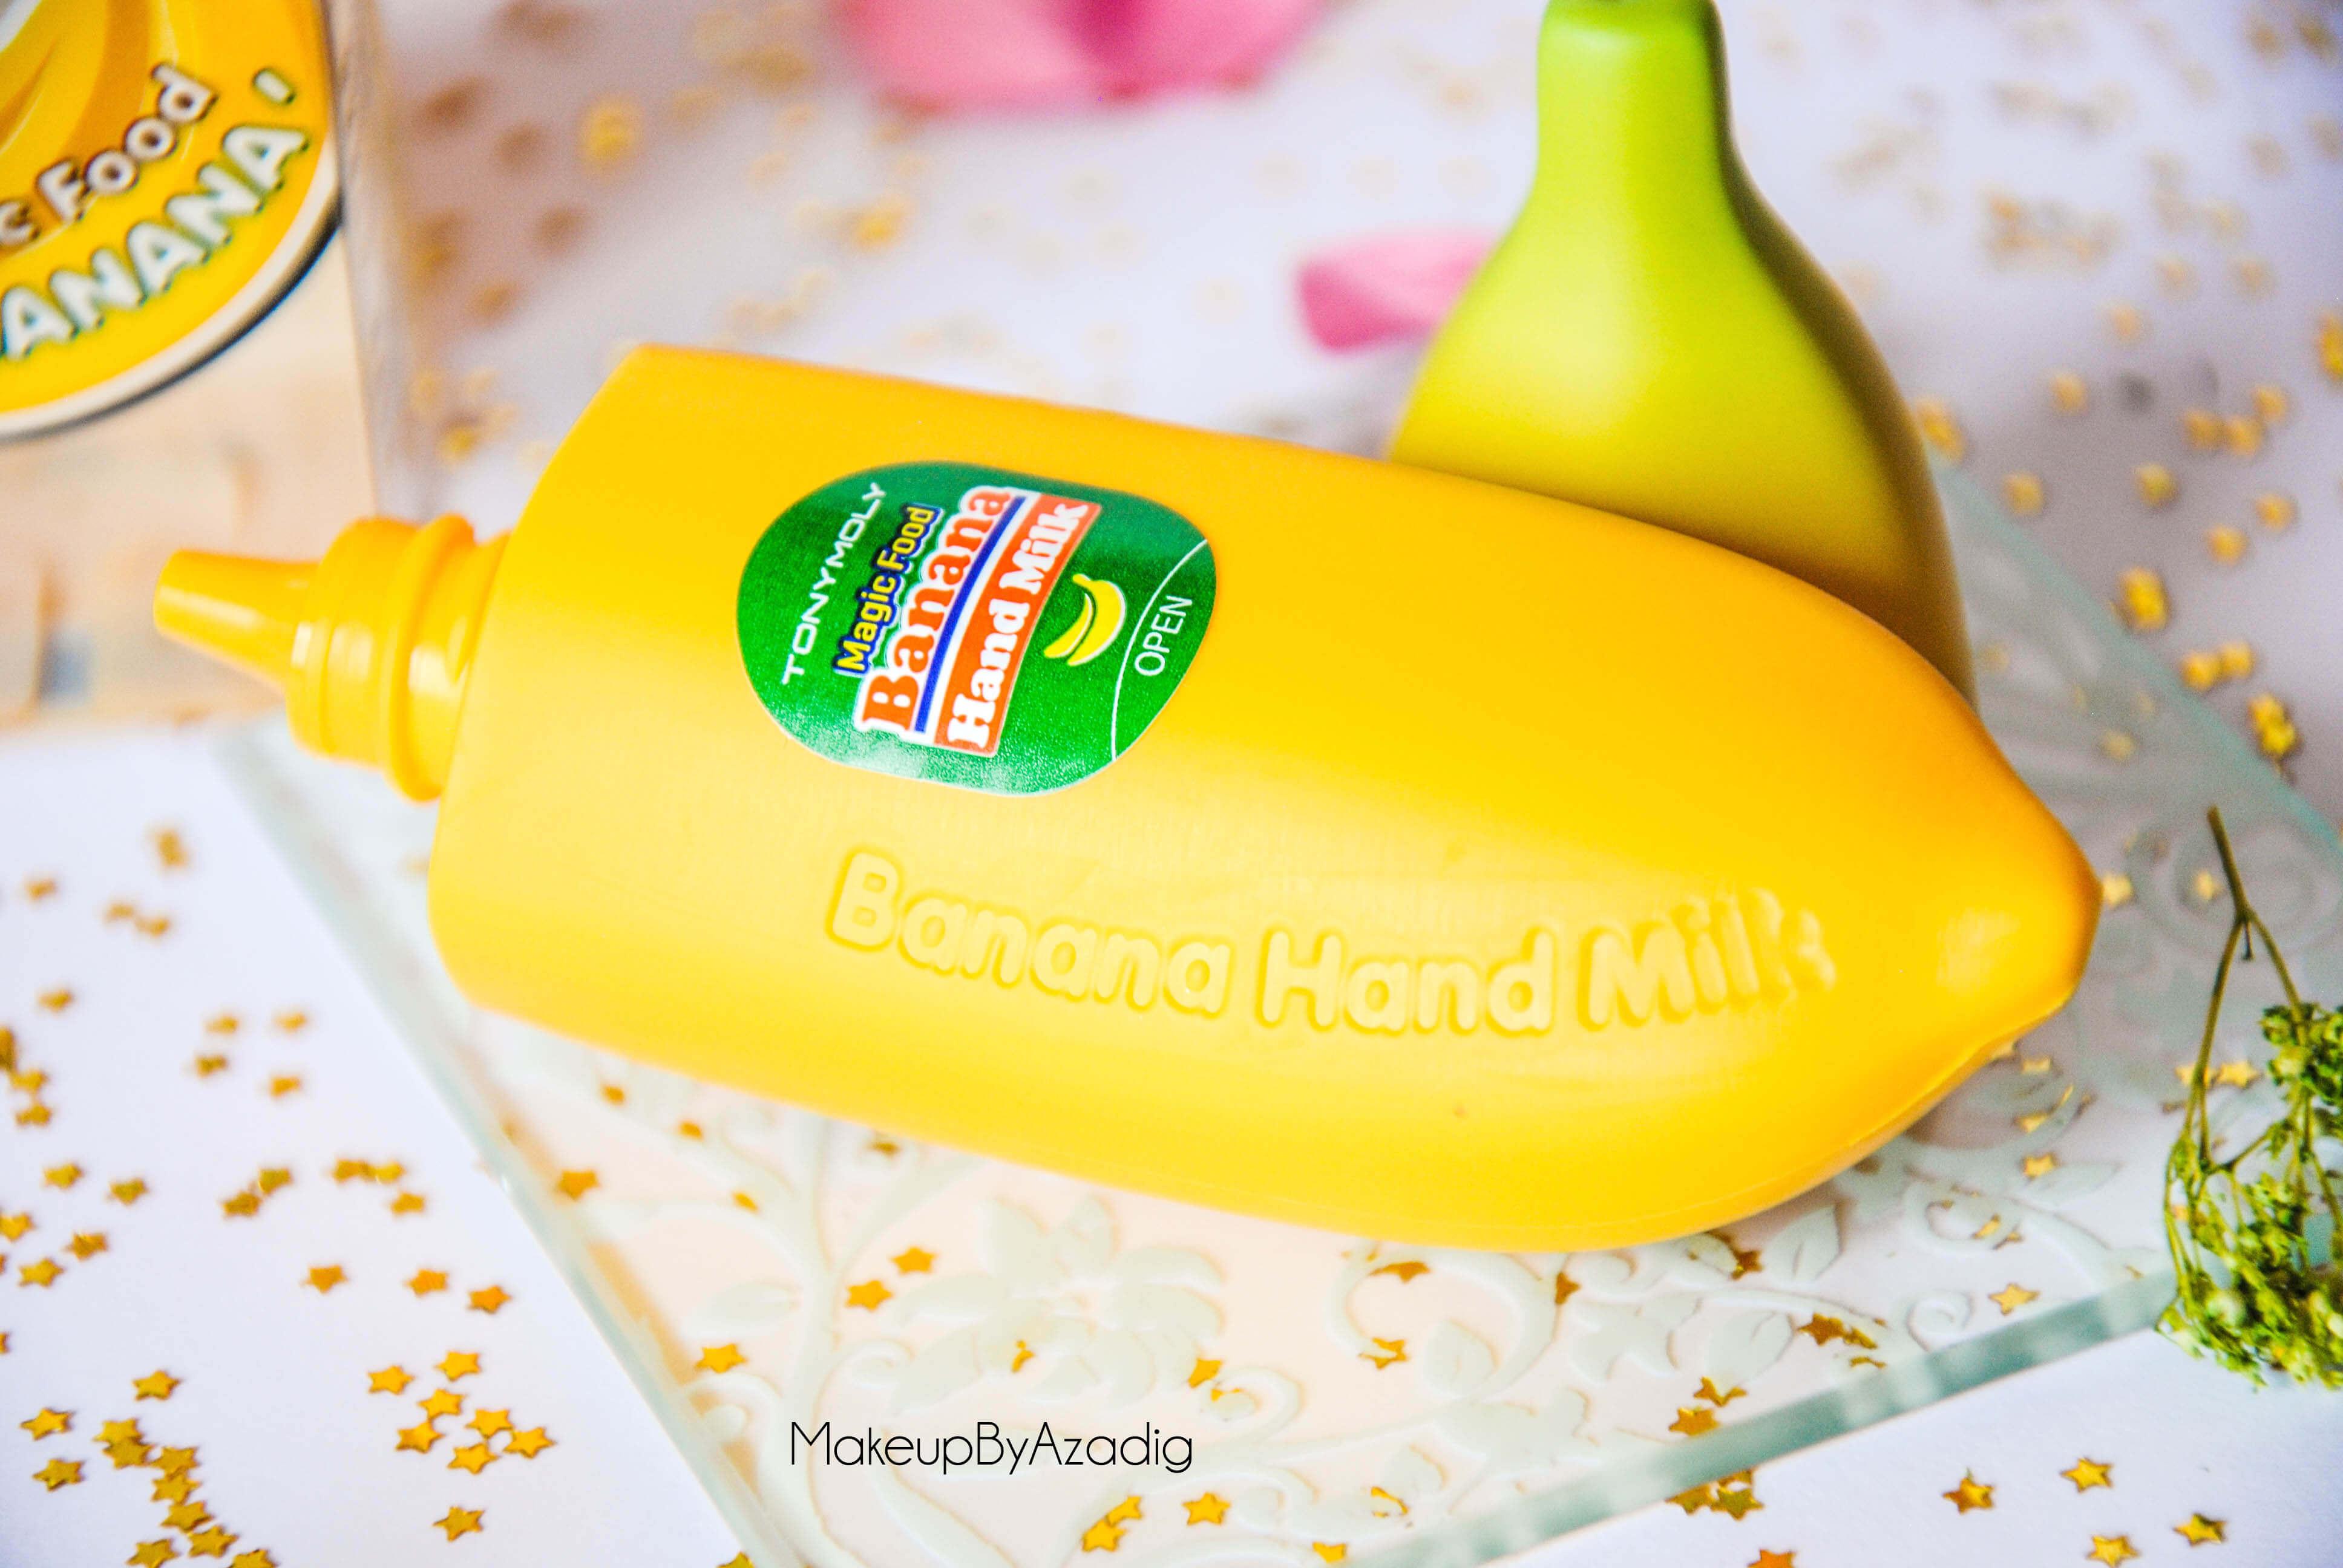 magic-food-banana-hand-milk-tonymoly-banane-creme-main-hand-cream-review-revue-paris-dijon-troyes-makeupbyazadig-kawai-gravure